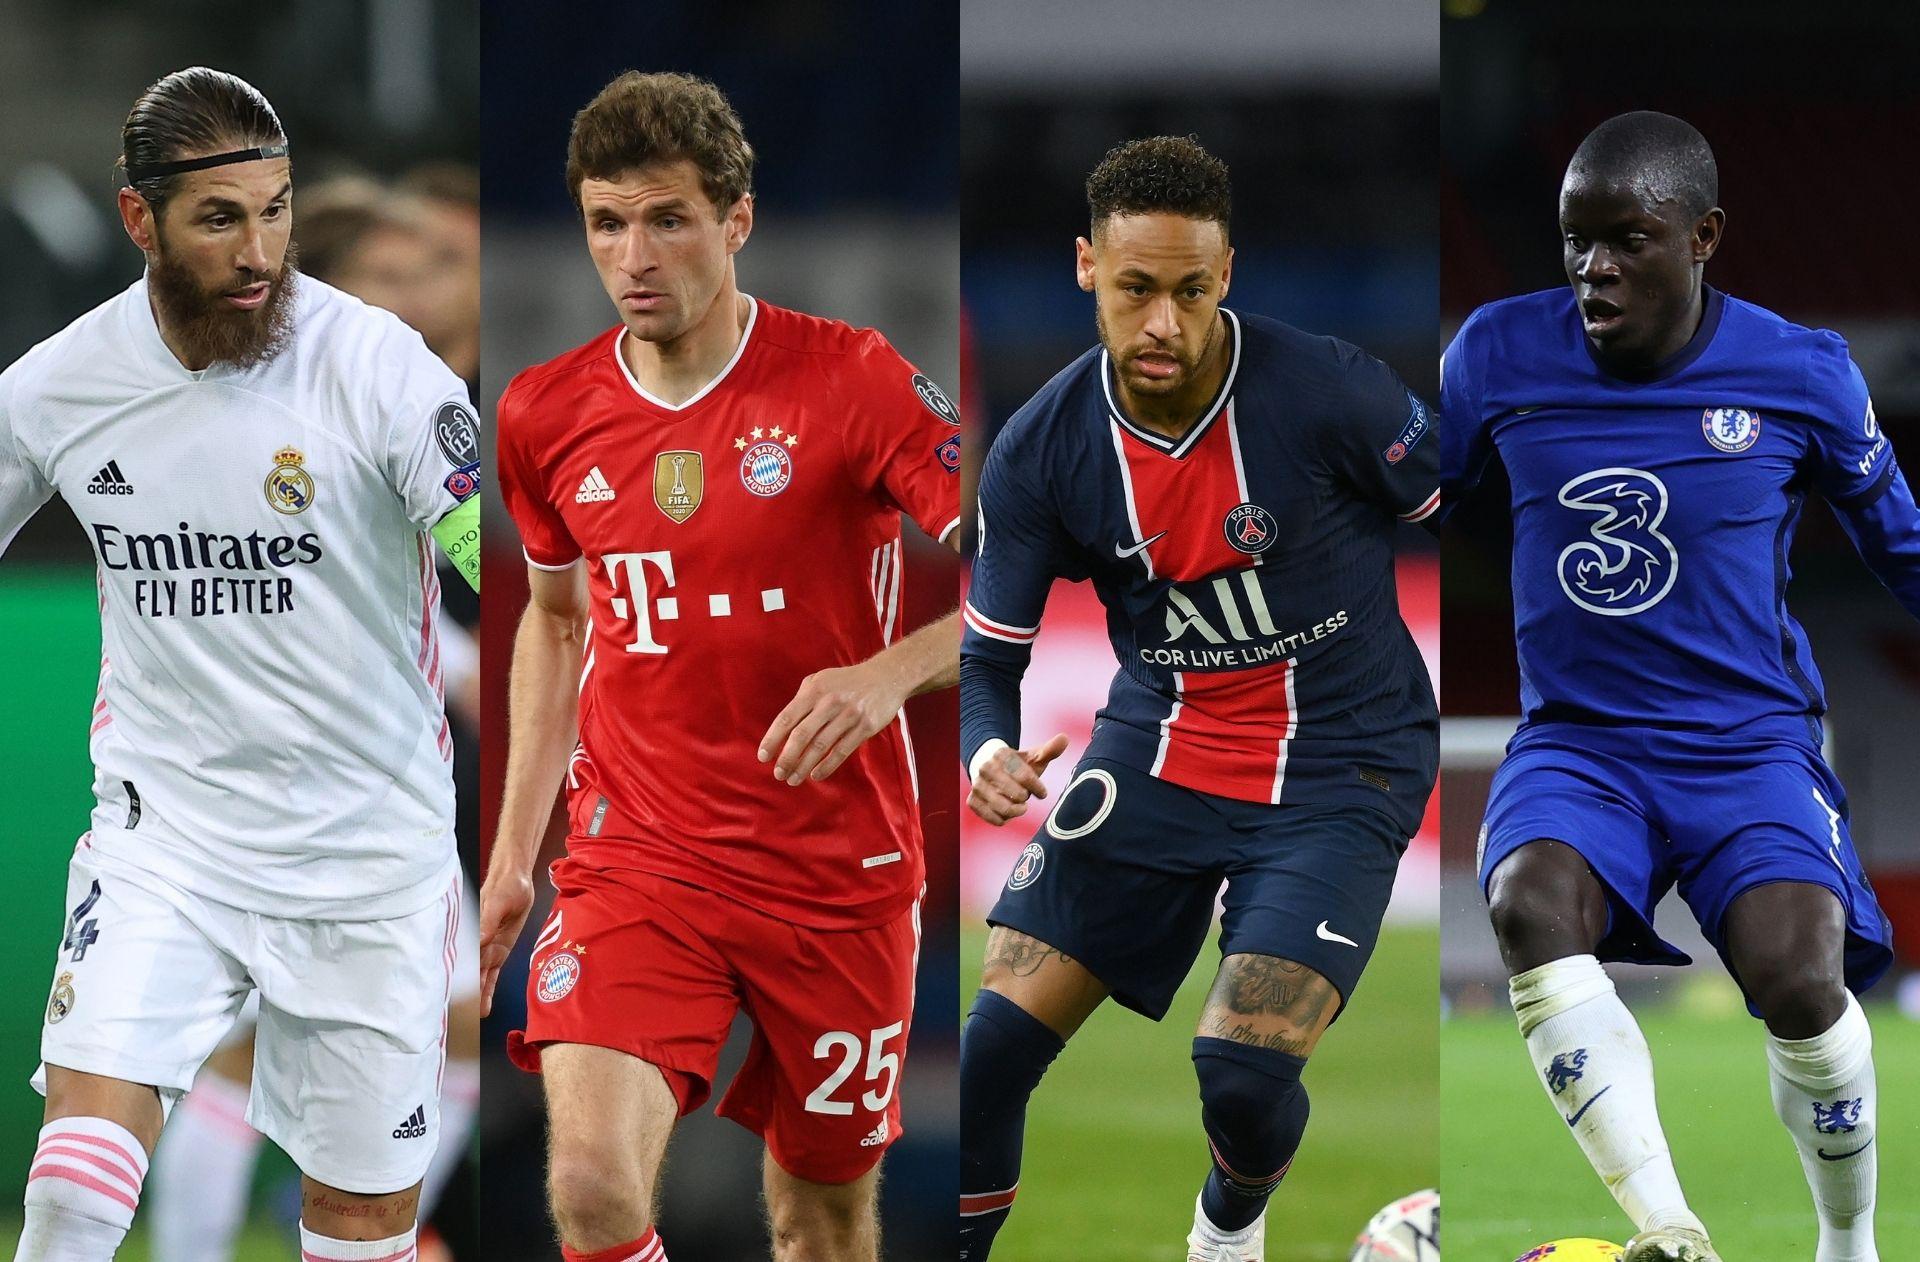 Sergio Ramos of Real Madrid, Thomas Muller of Bayern Munich, Neymar of PSG, N'Golo Kante of Chelse